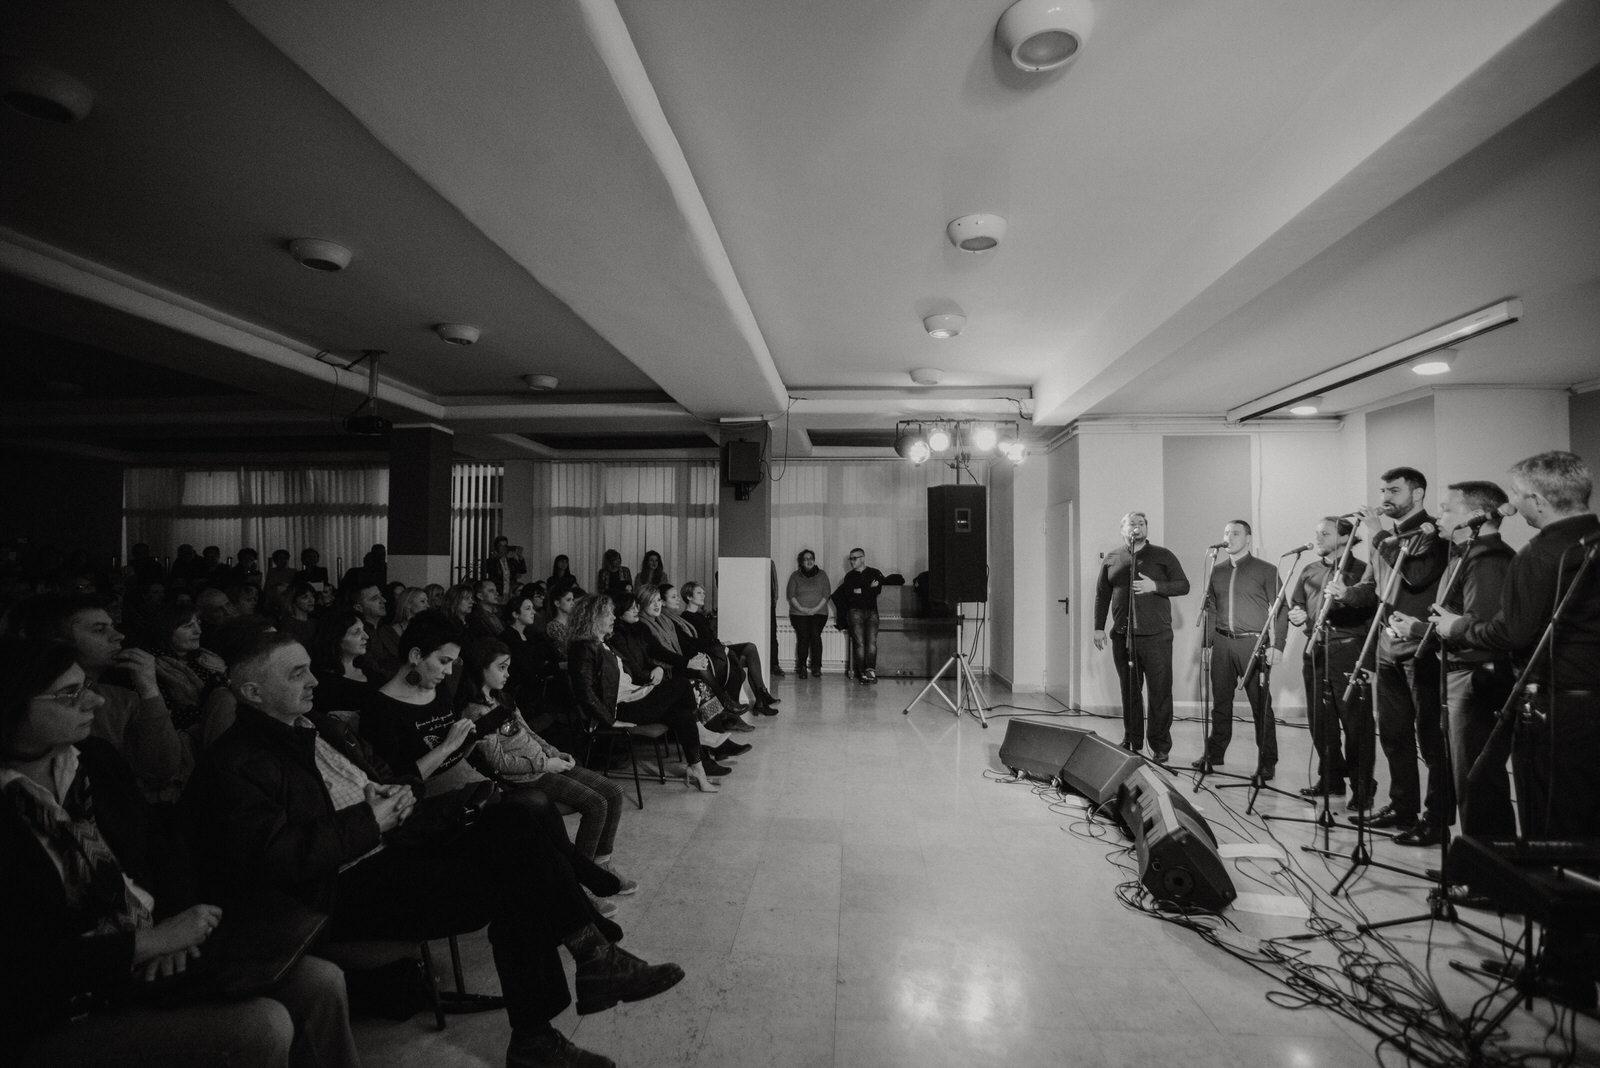 likaclub_koncert-klapa-cambi_kic-gospić_2019-21